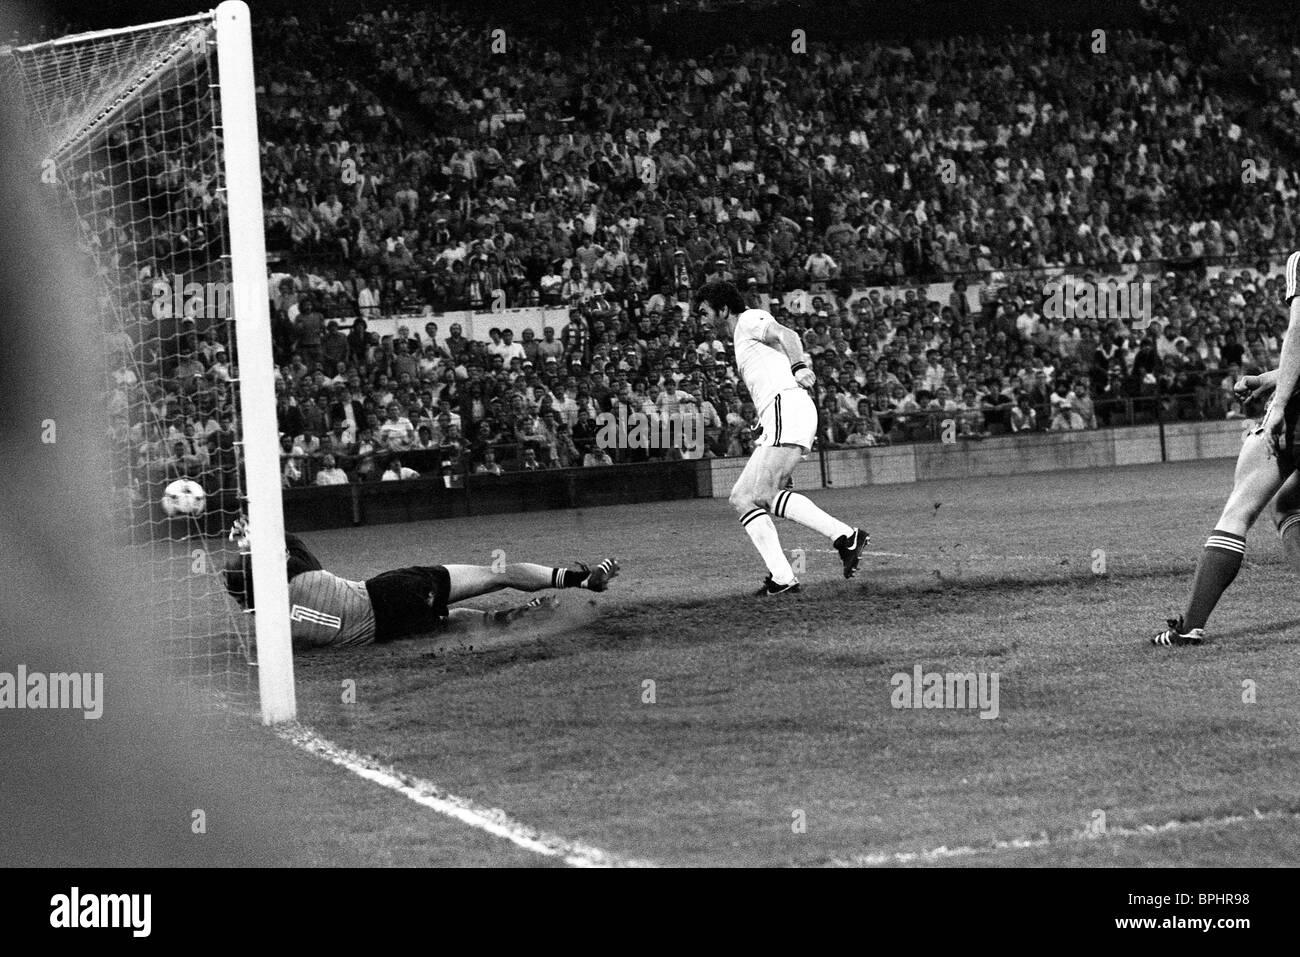 European Cup Final In Rotterdam 26 5 82 Aston Villa V Bayern Munich Stock Photo Alamy